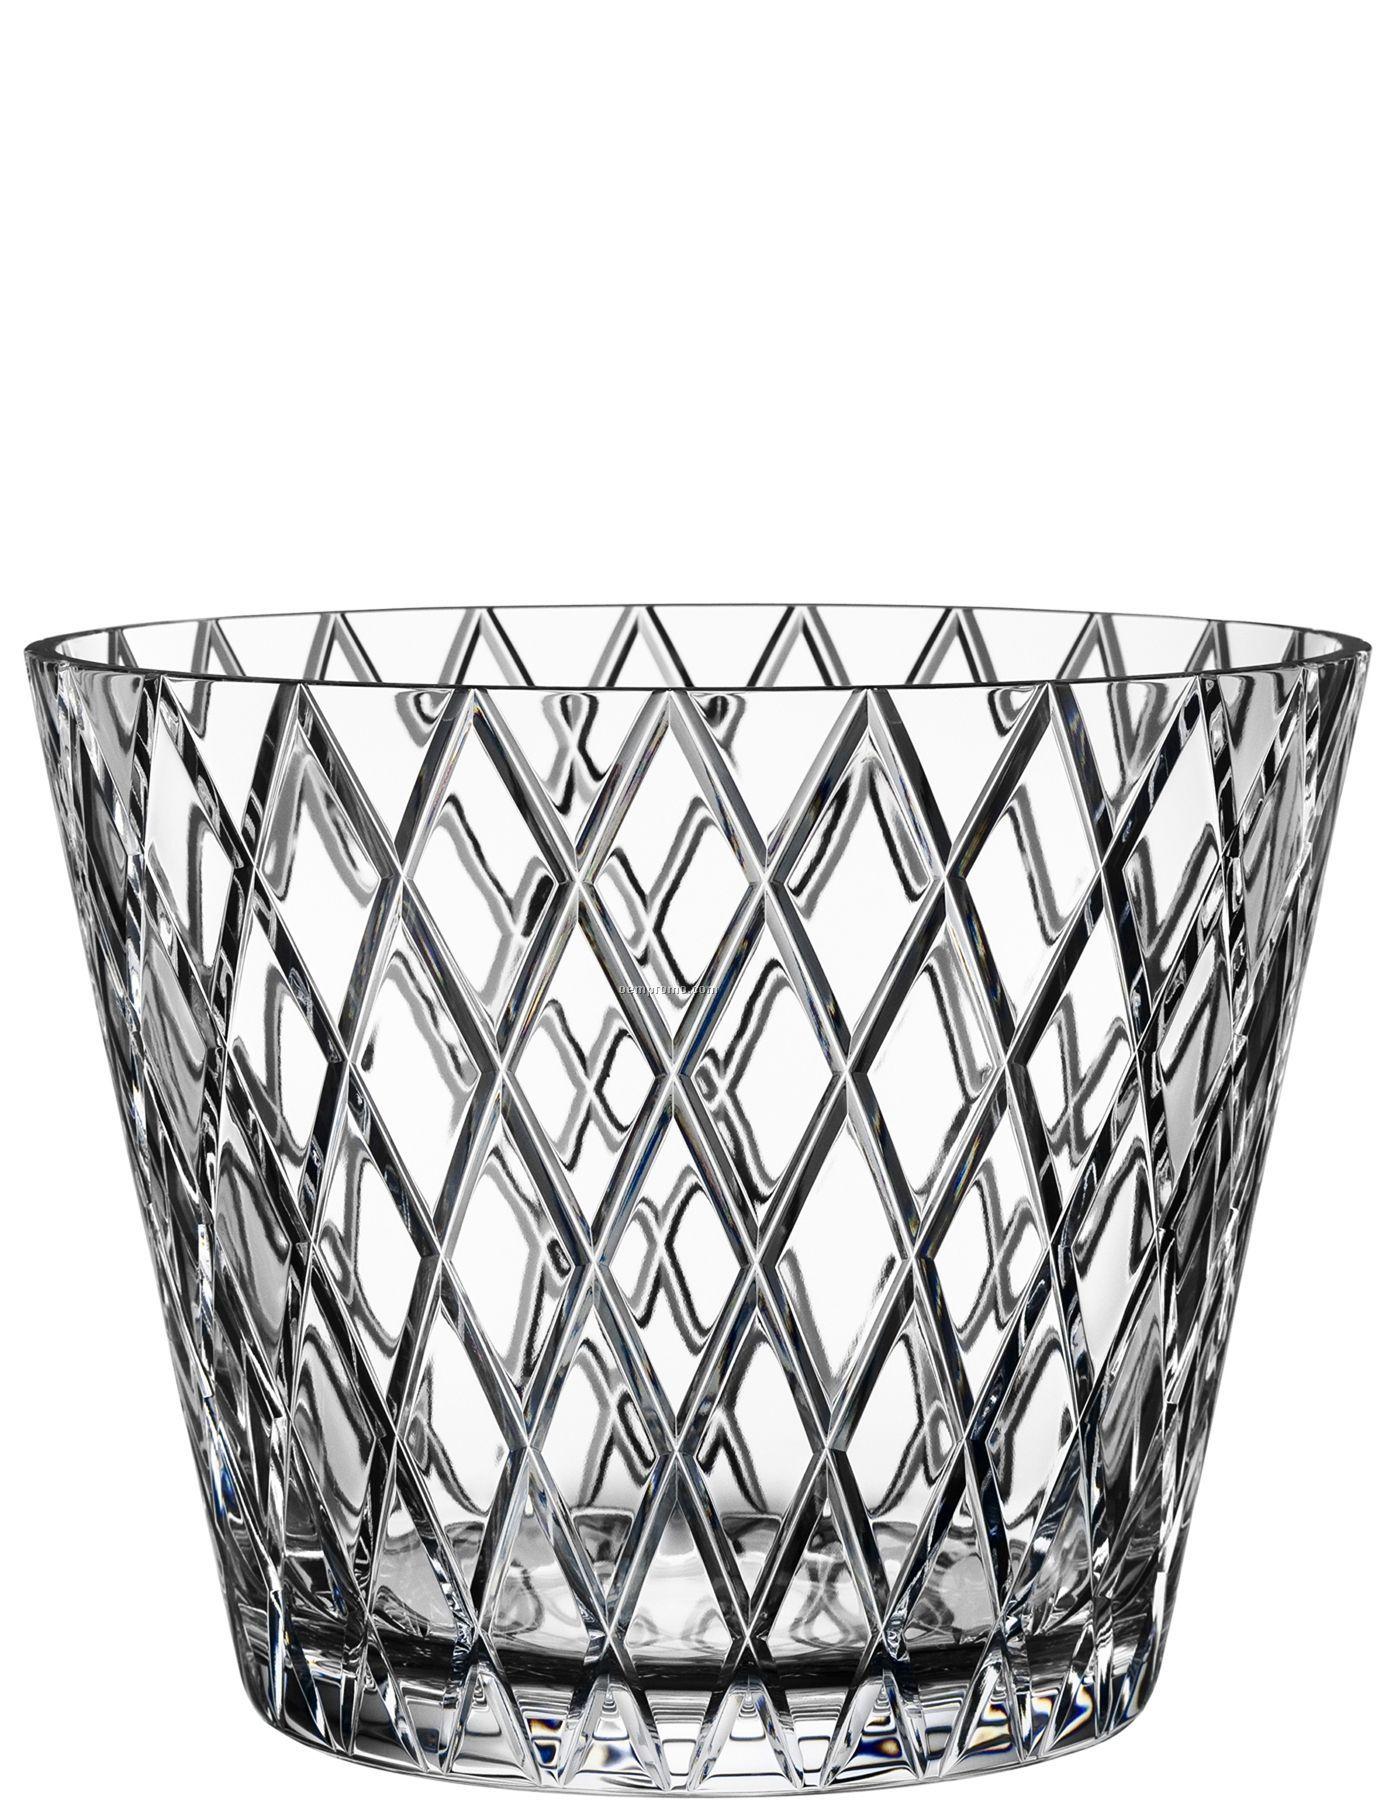 Crystal Diamond Silver Golden Round Flower Heart Anklet: Chess Crystal Bowl W/ Diamond Pattern By Ingegerd Raman